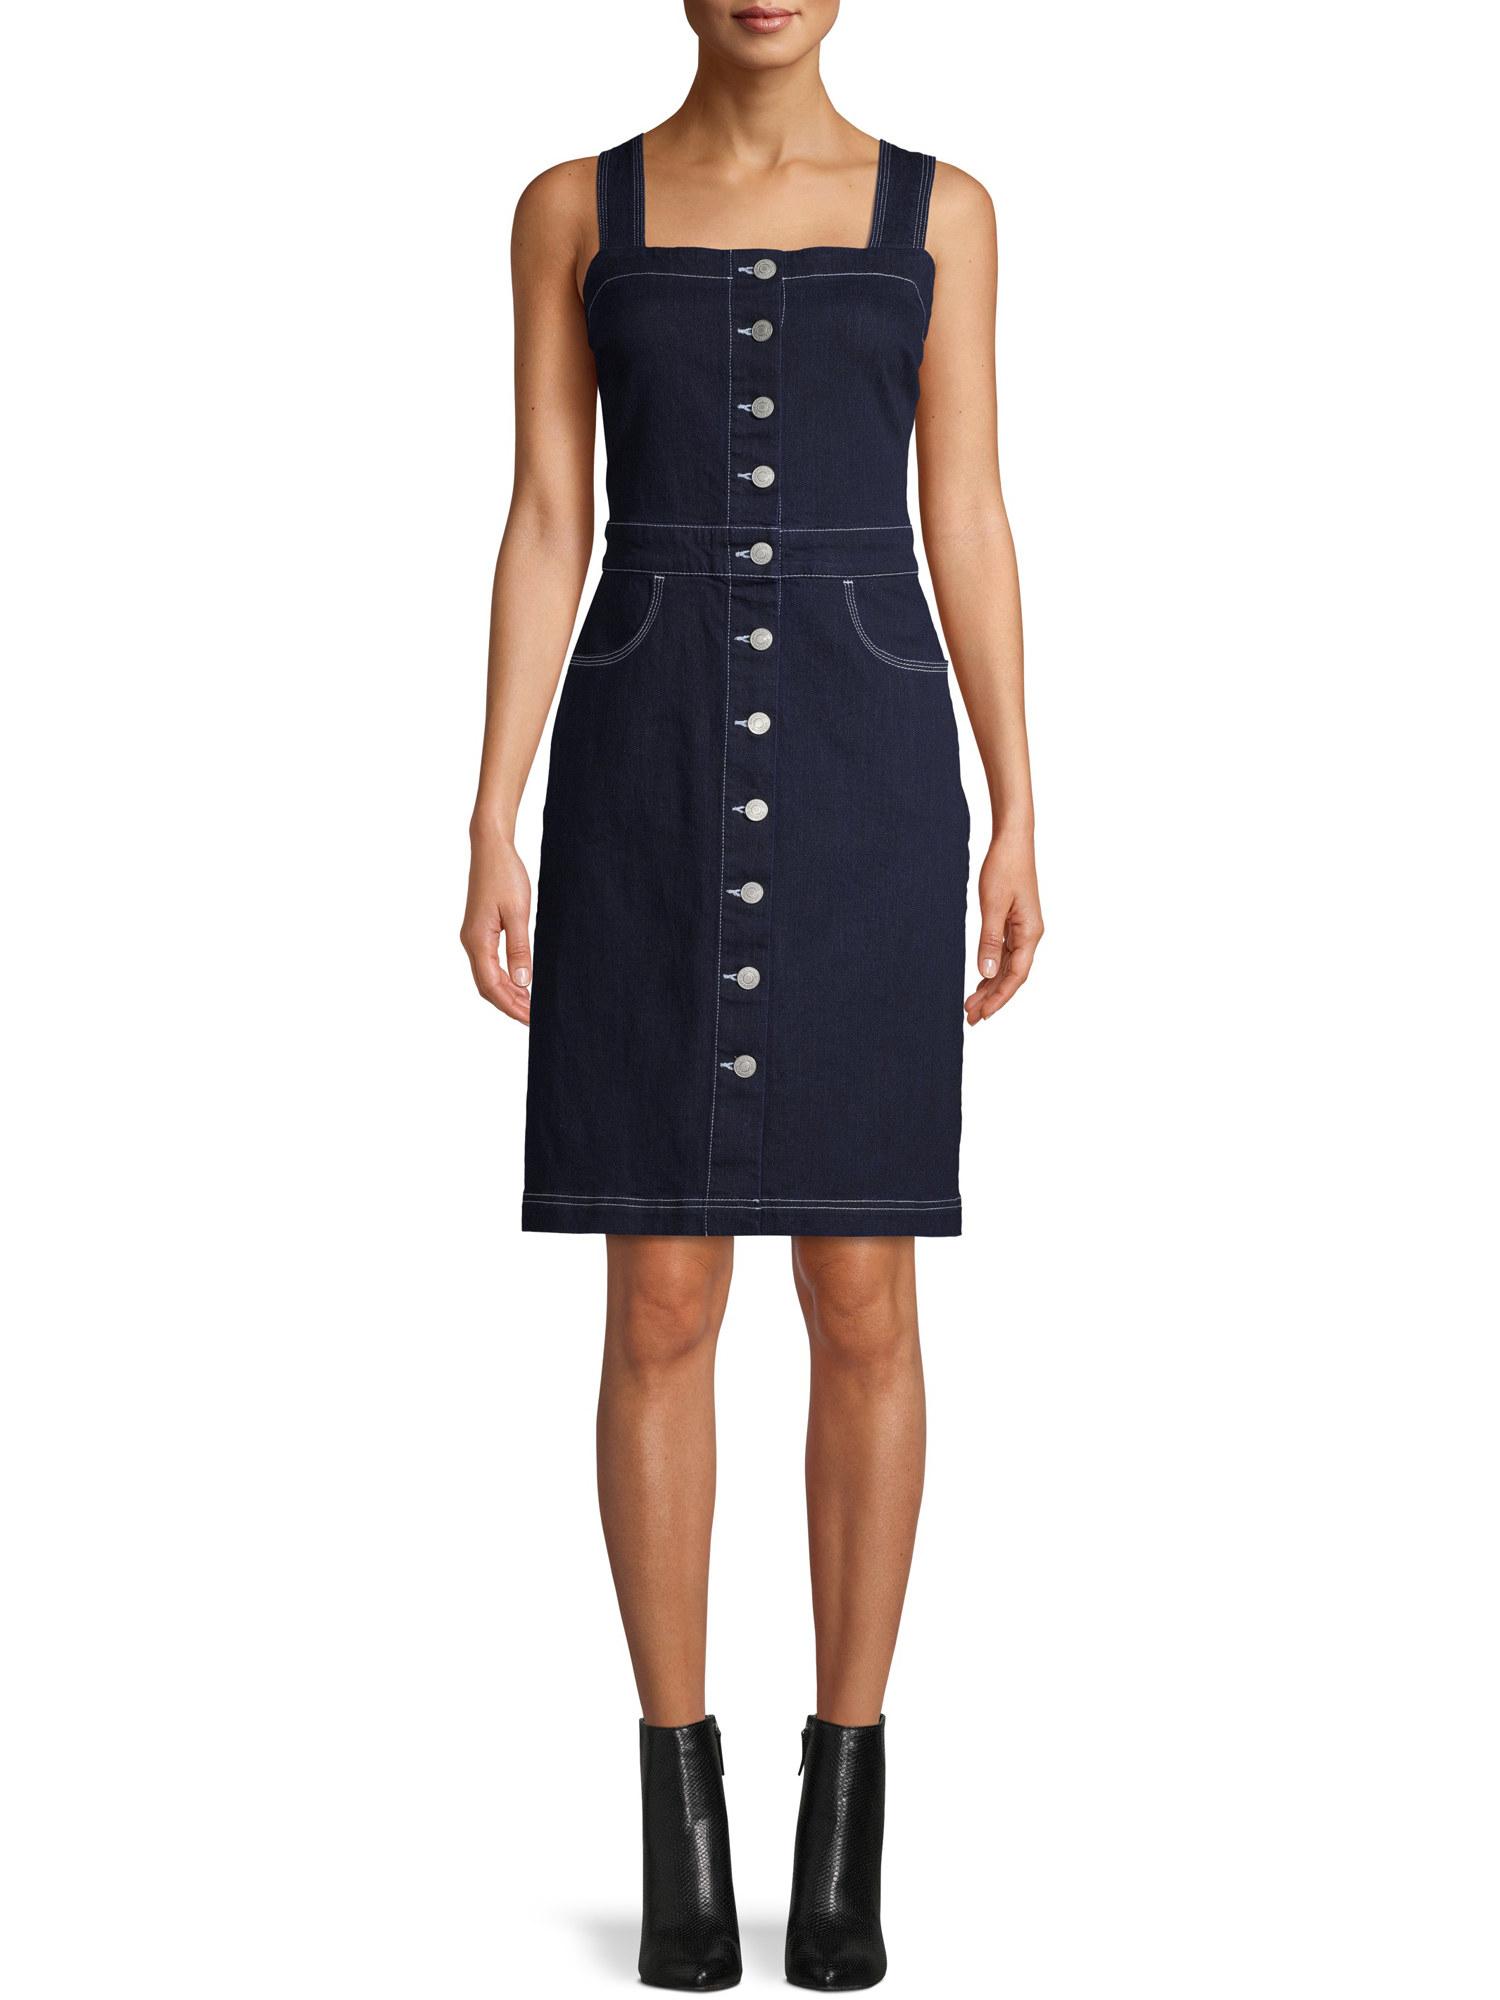 Model in button up sleeveless denim dress